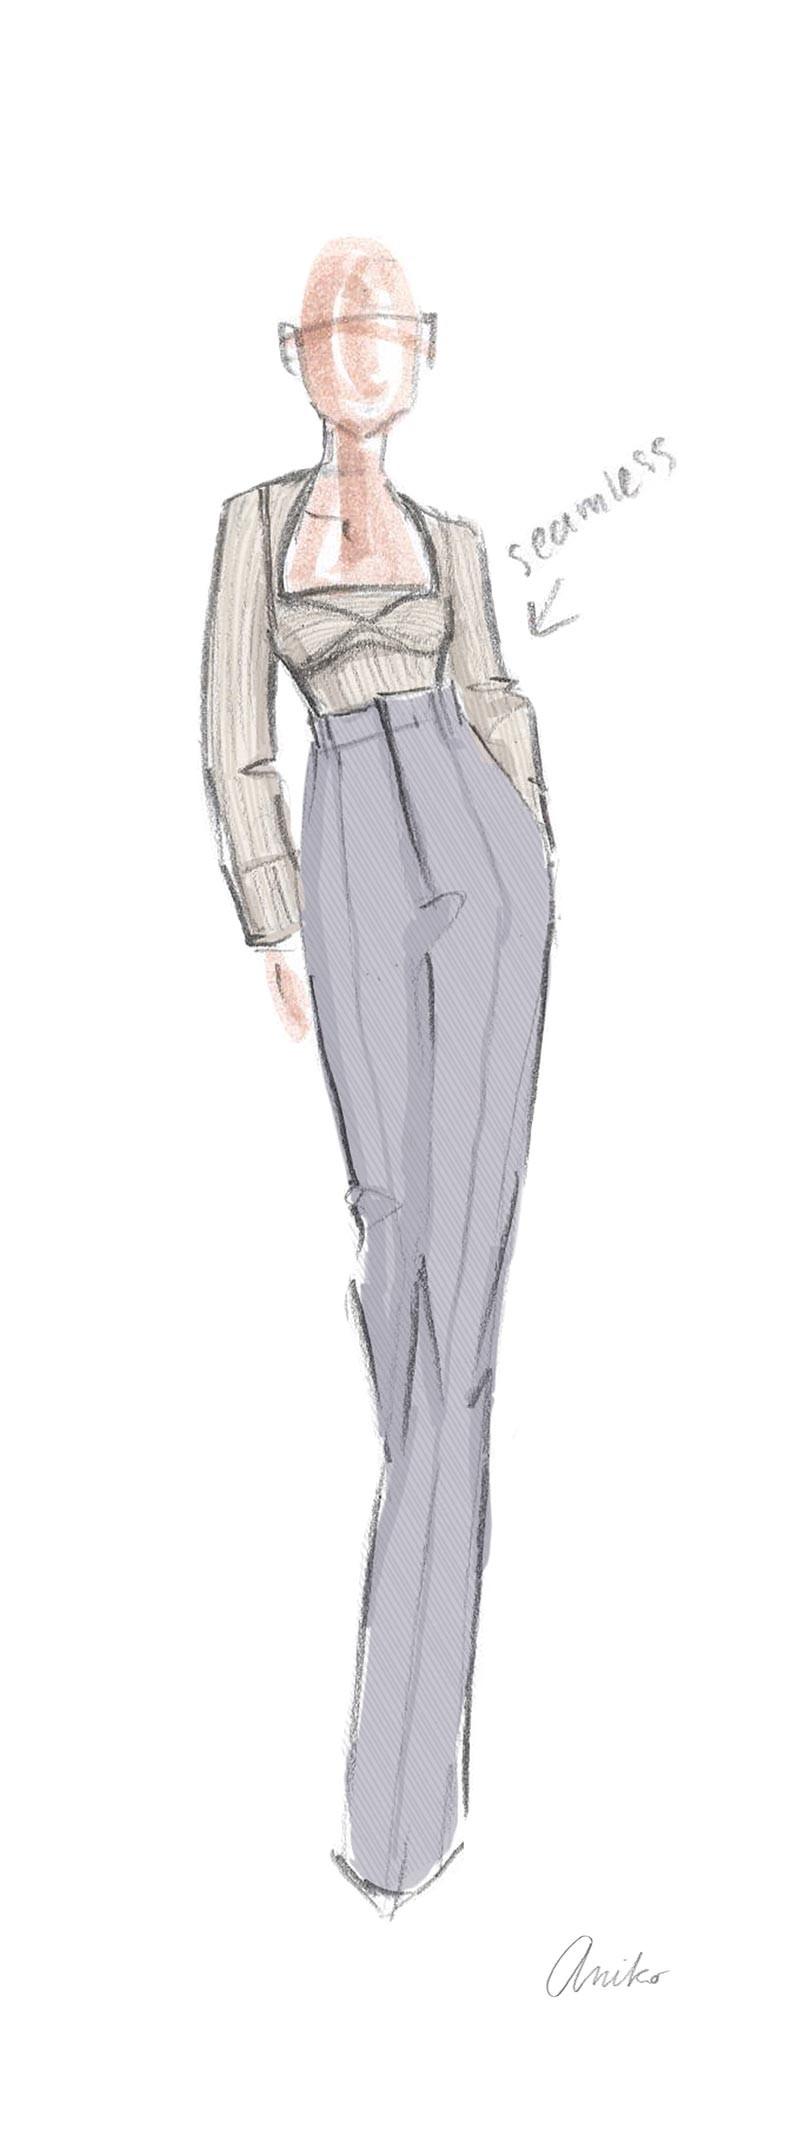 Chloe Sketch